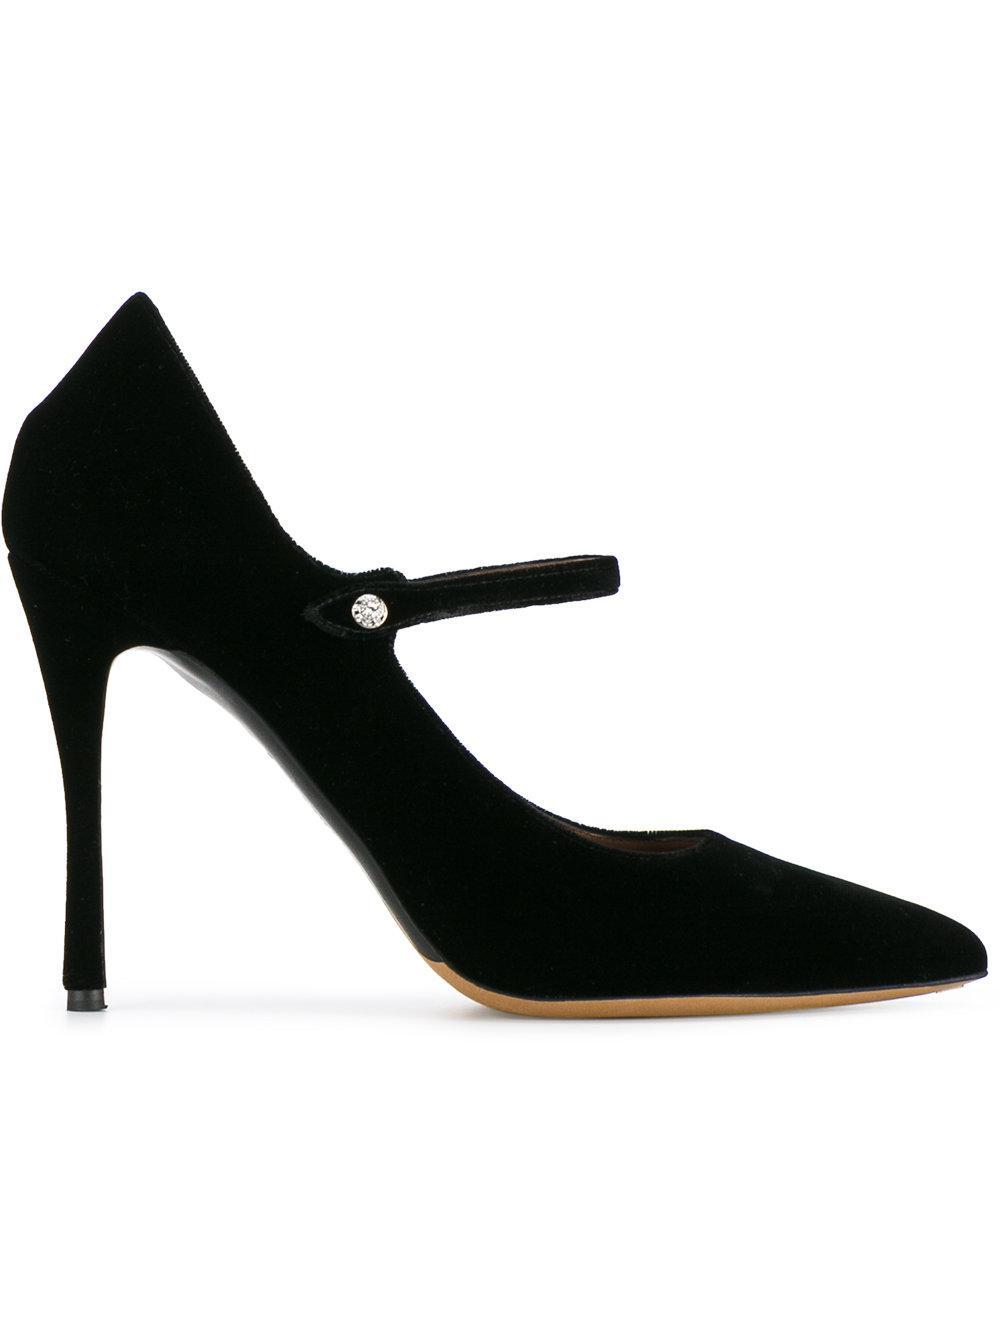 Tabitha Simmons Sale Shoes